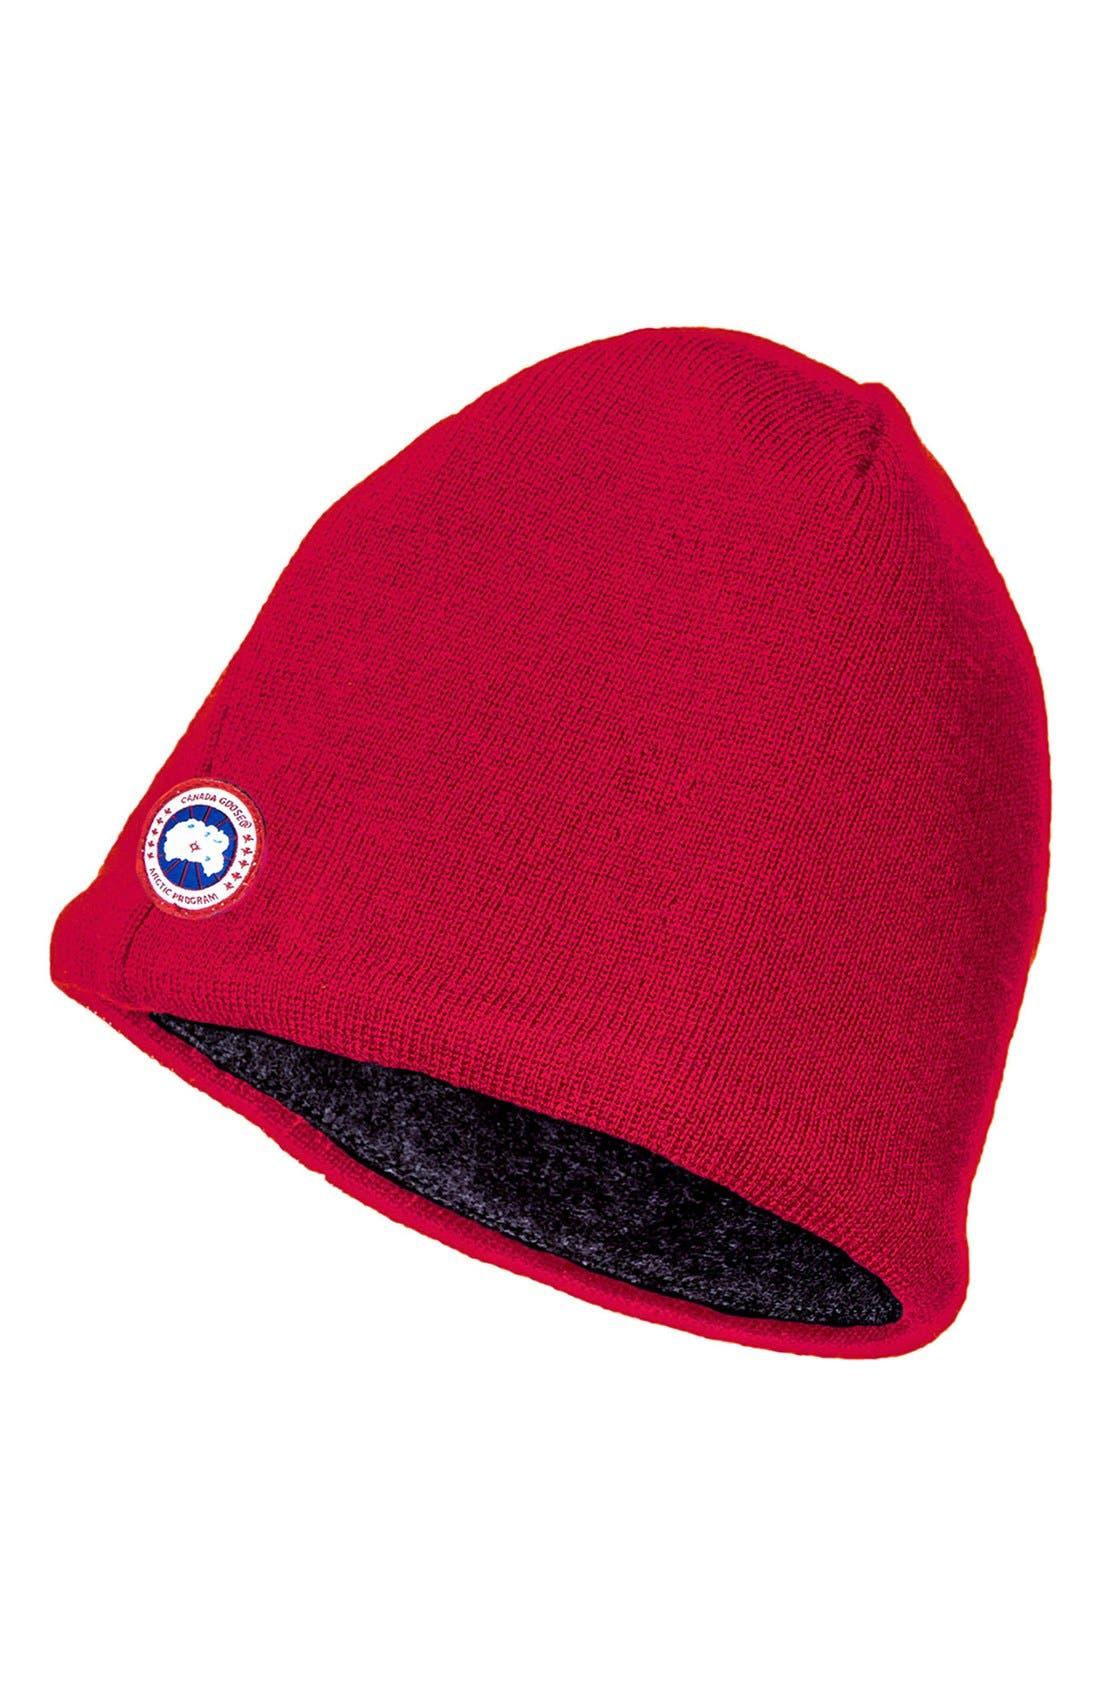 Merino Wool Beanie,                             Main thumbnail 1, color,                             Red